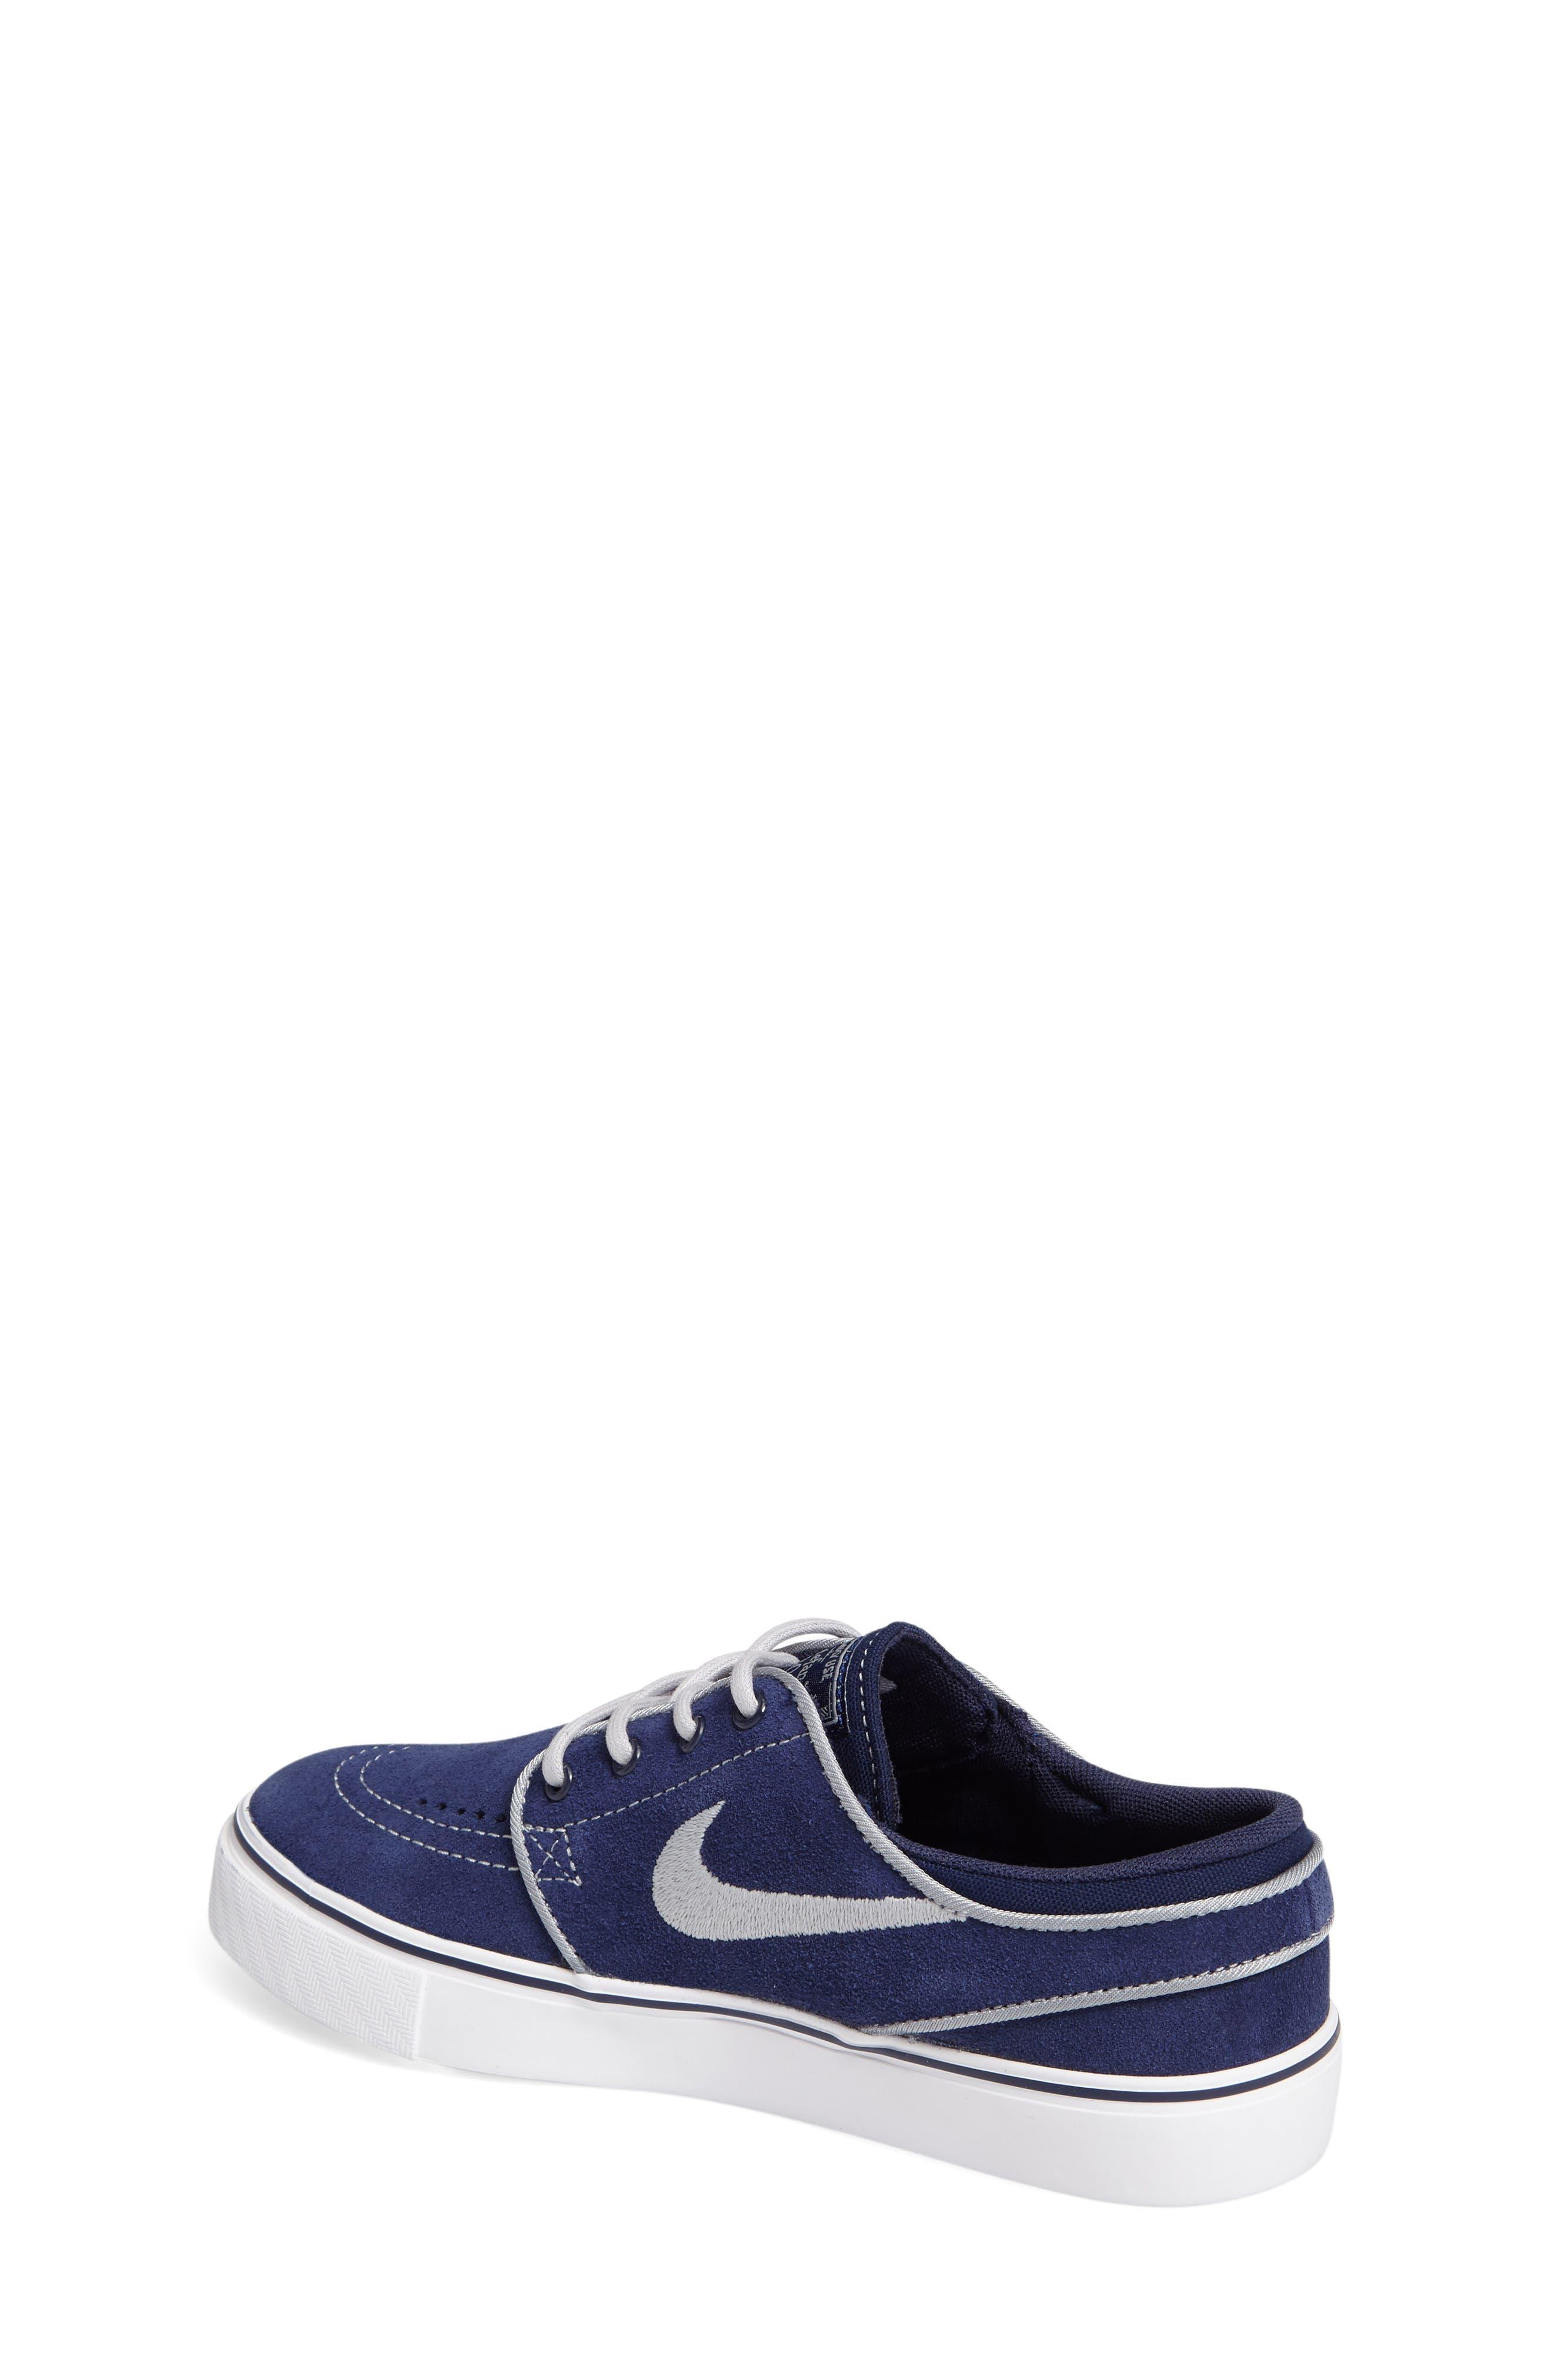 'Stefan Janoski' Sneaker,                             Alternate thumbnail 26, color,